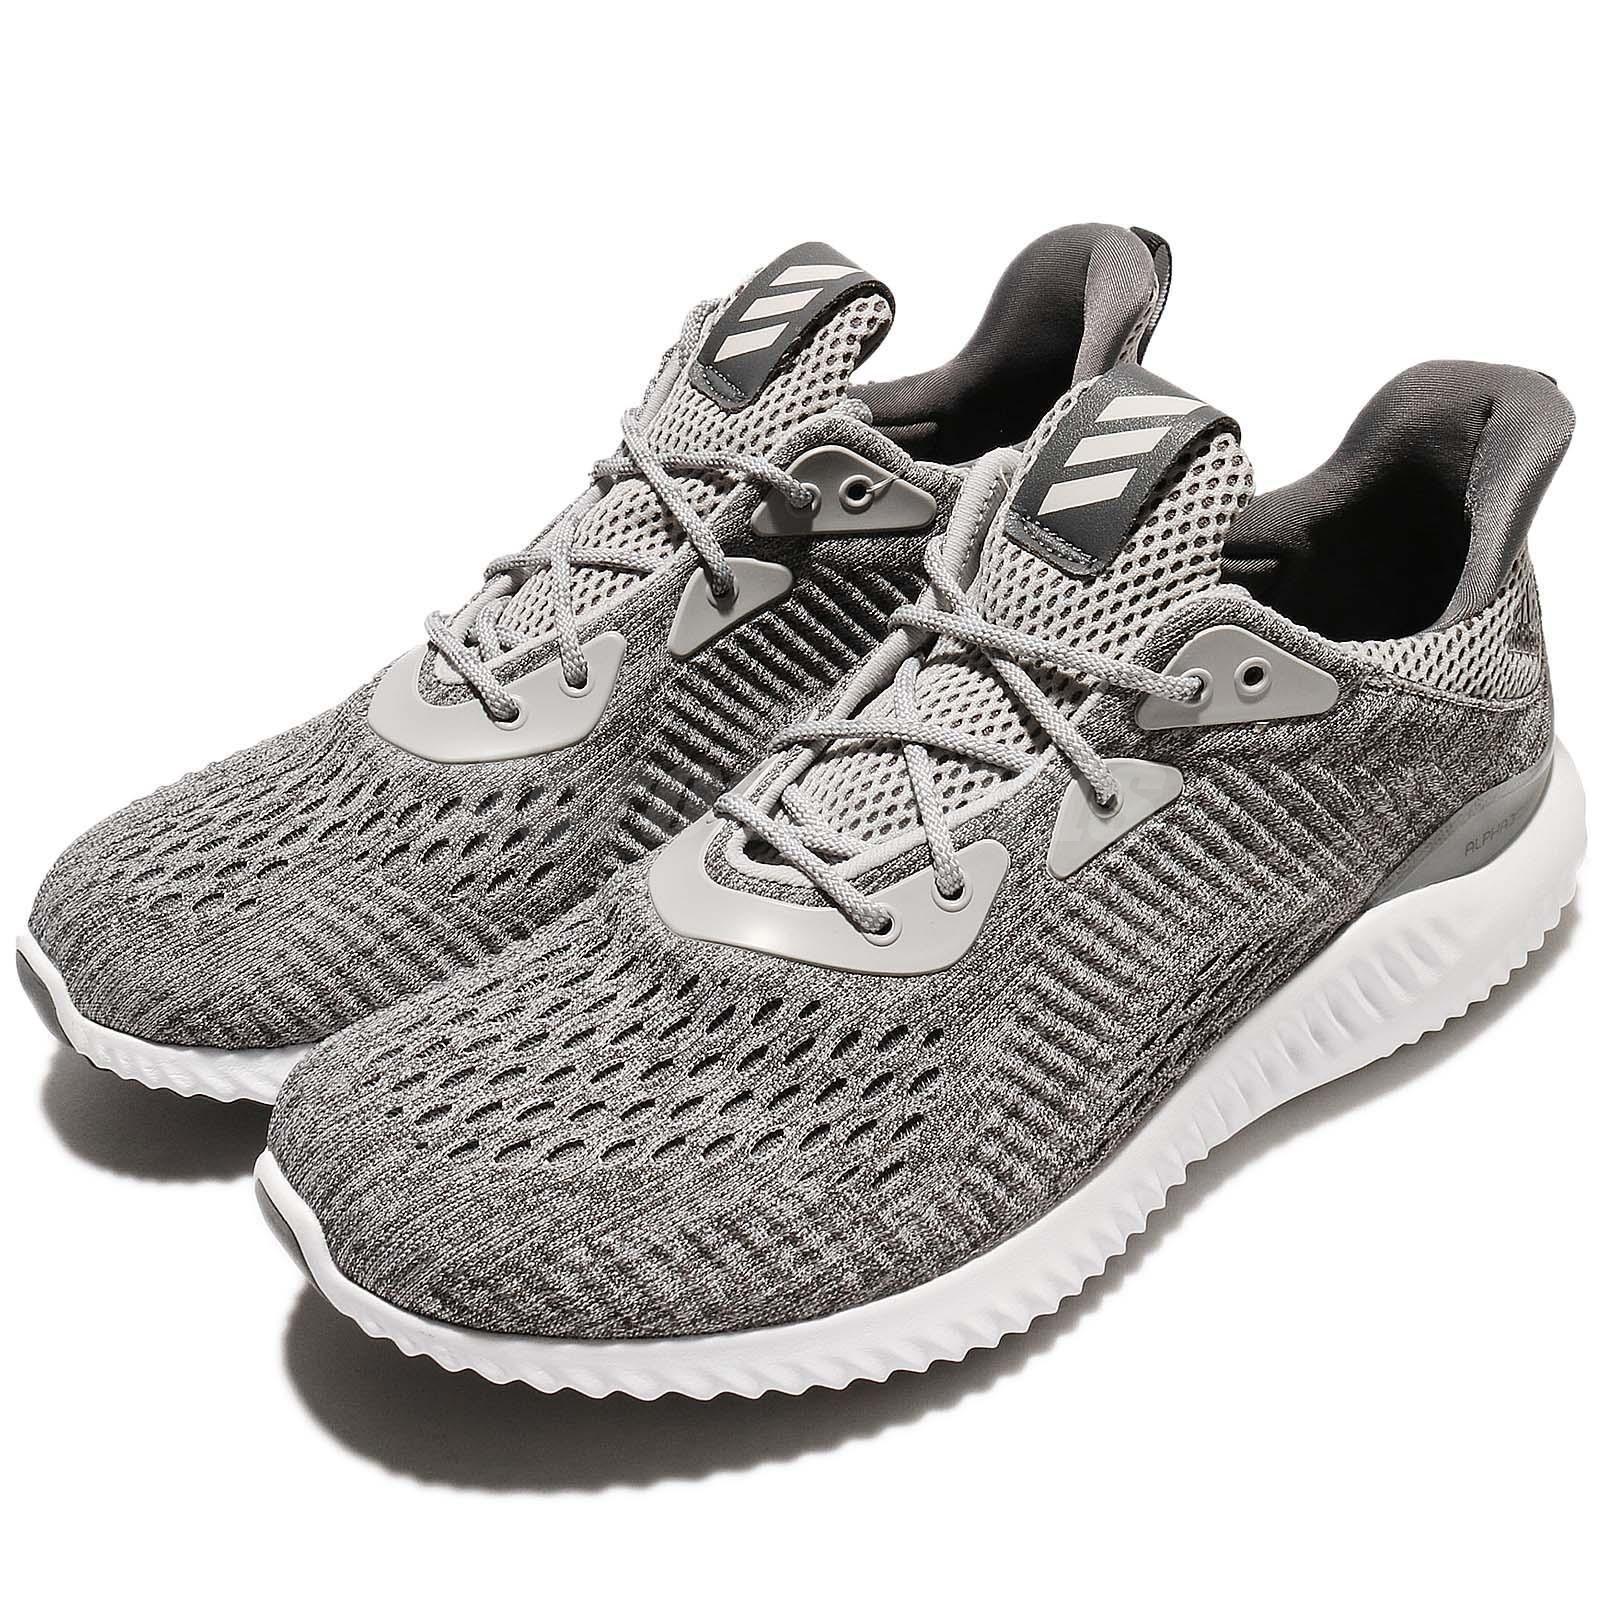 Adidas Alphabounce Em M Engineered Mesh Grey White Men Running